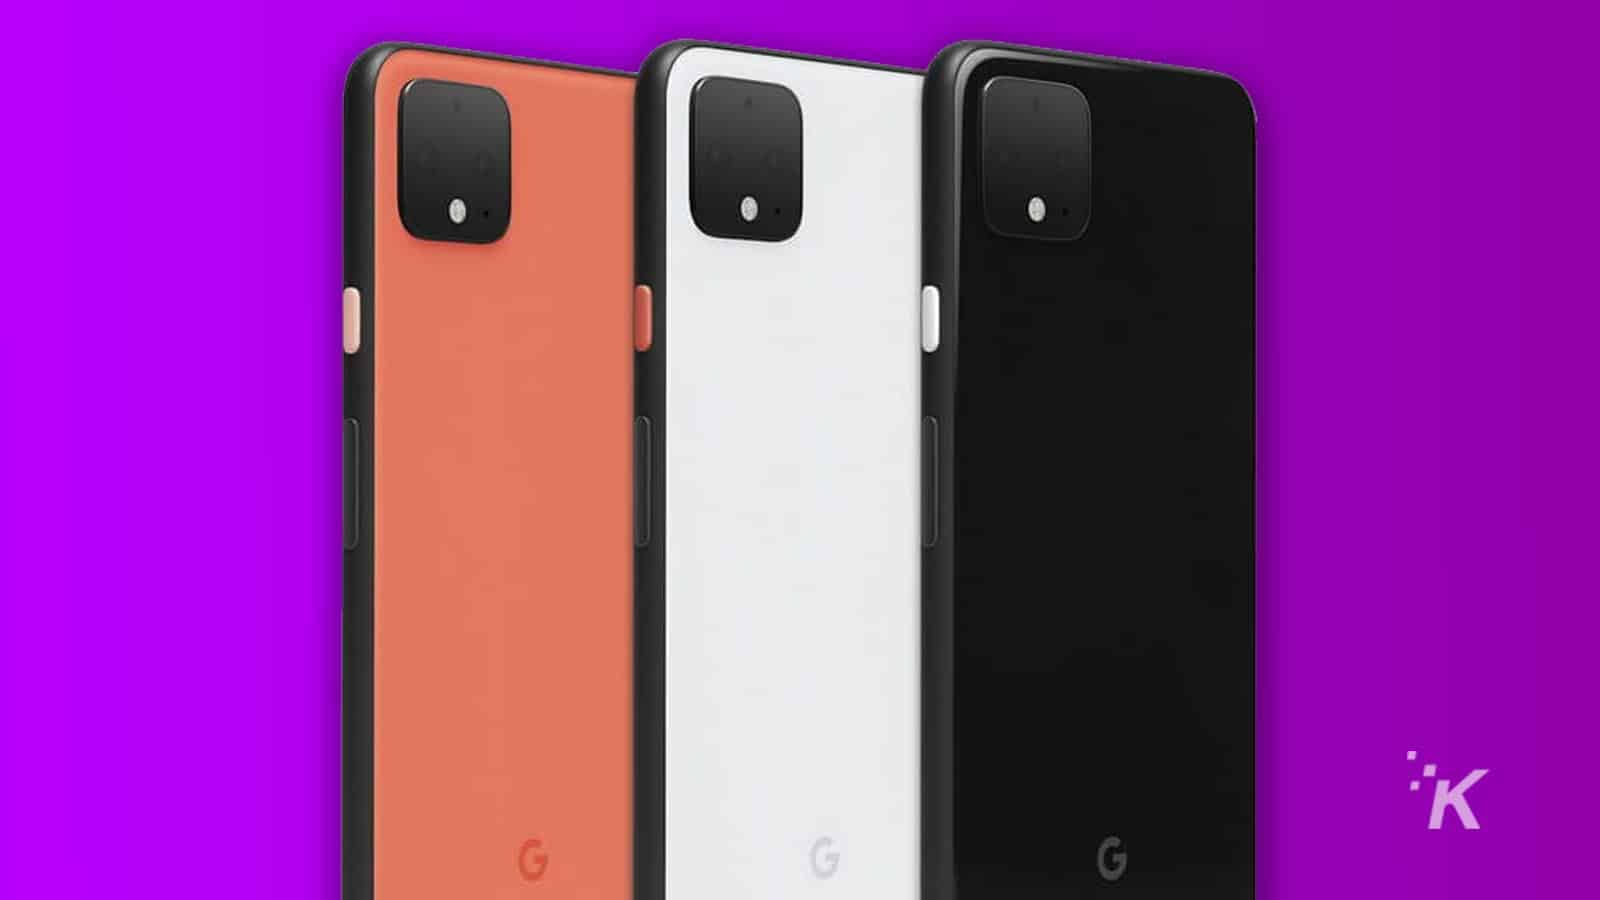 google pixel 4 on purple background